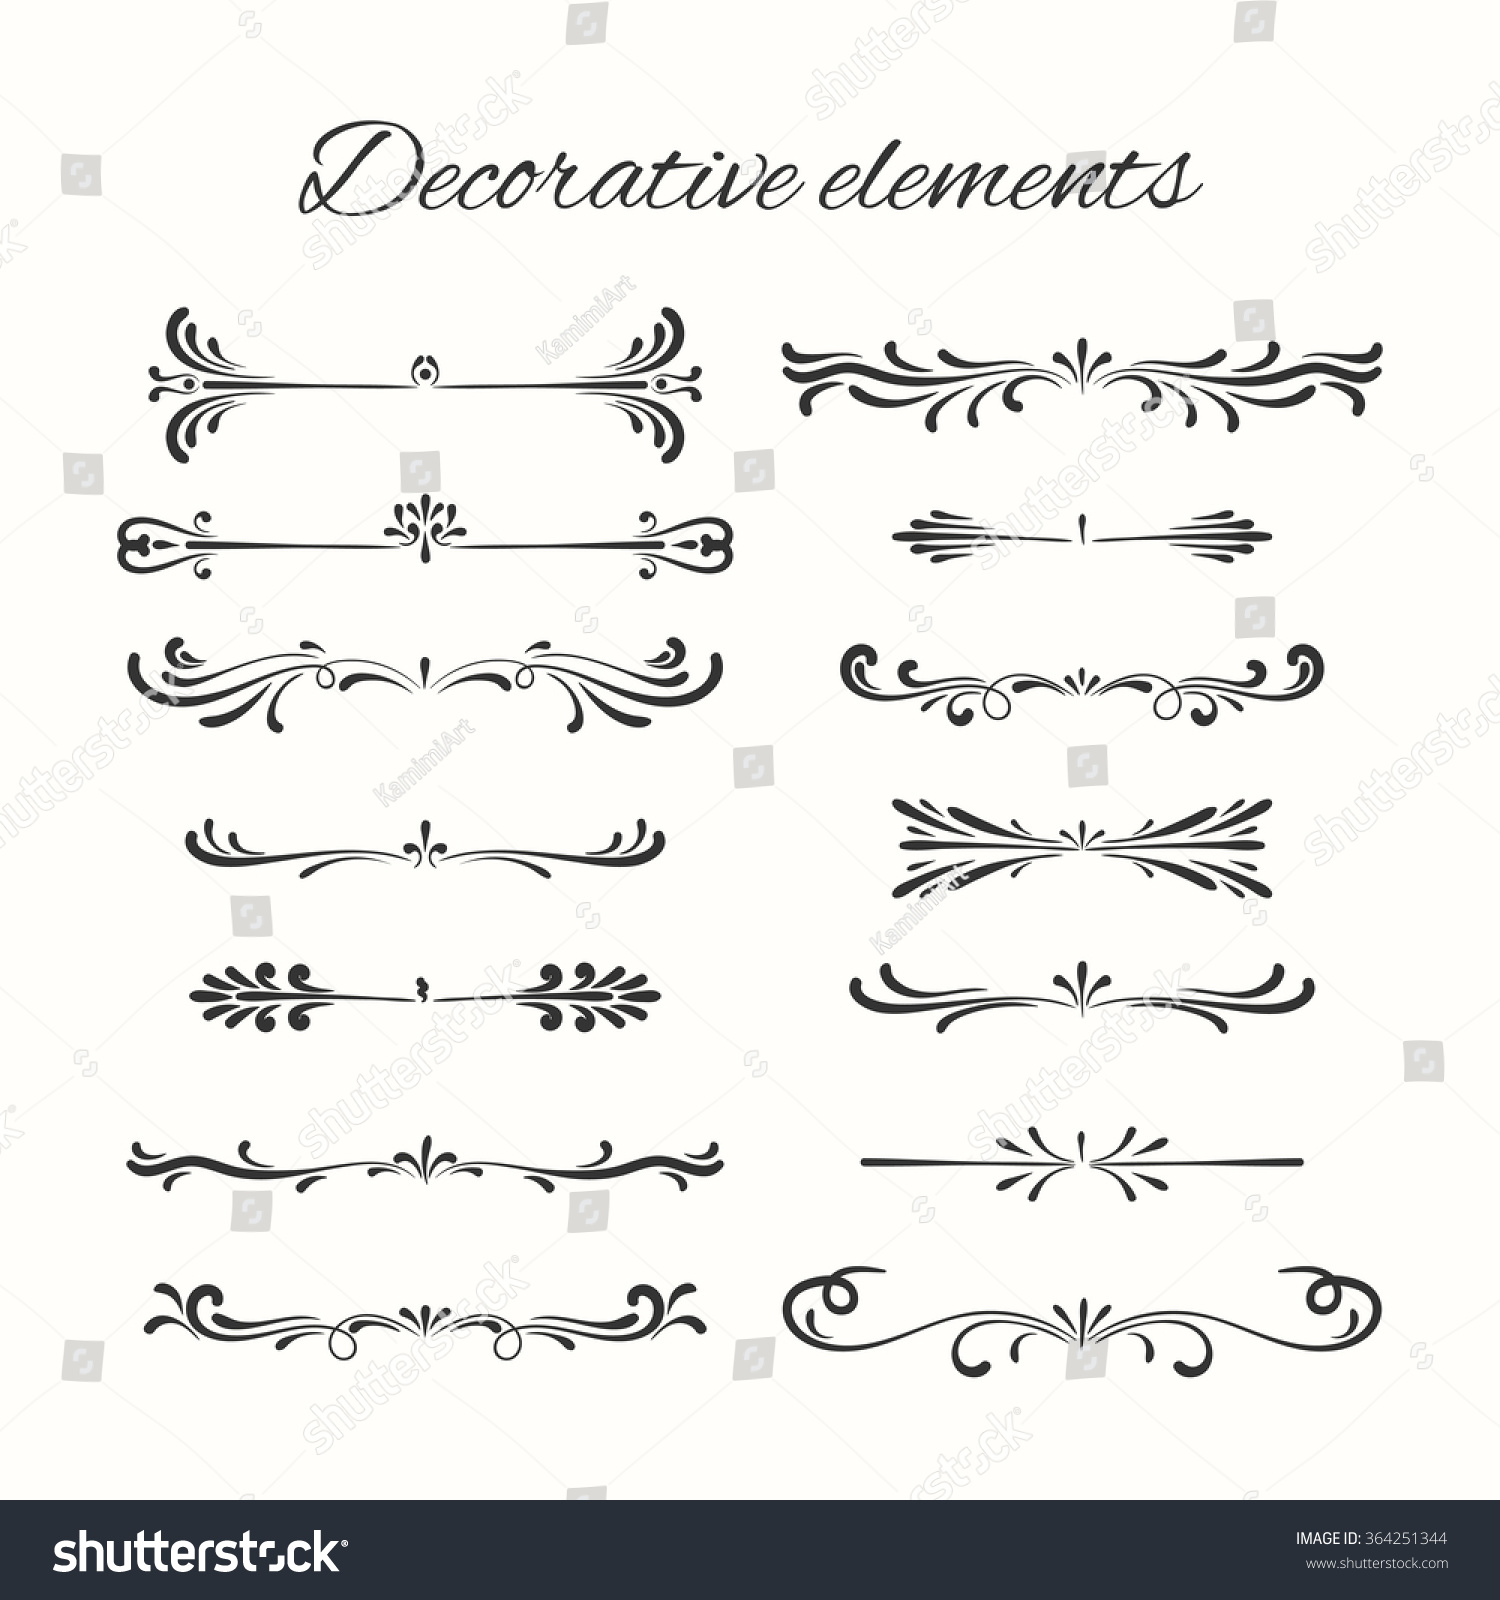 divider set vector - photo #37